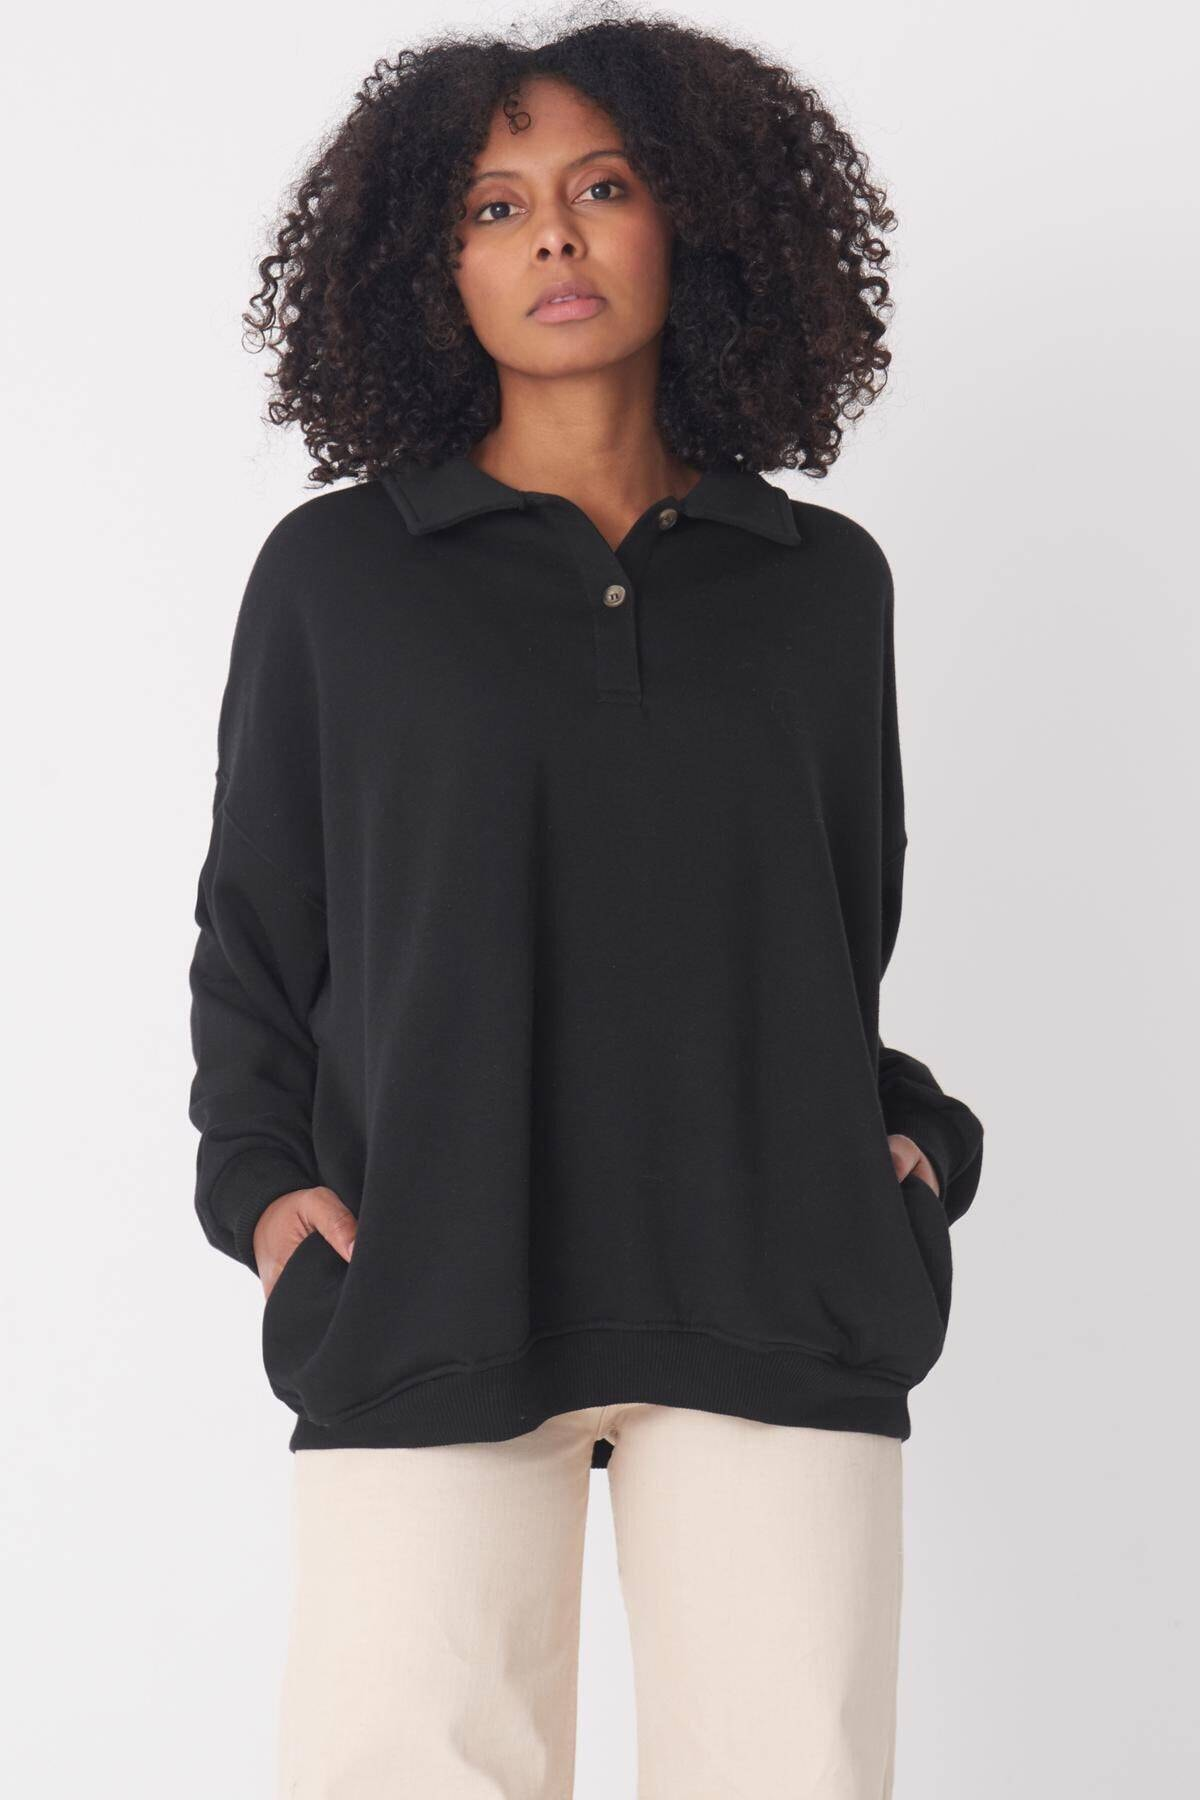 Addax Kadın Siyah Gömlek Yaka Sweat S0703 - C13 1